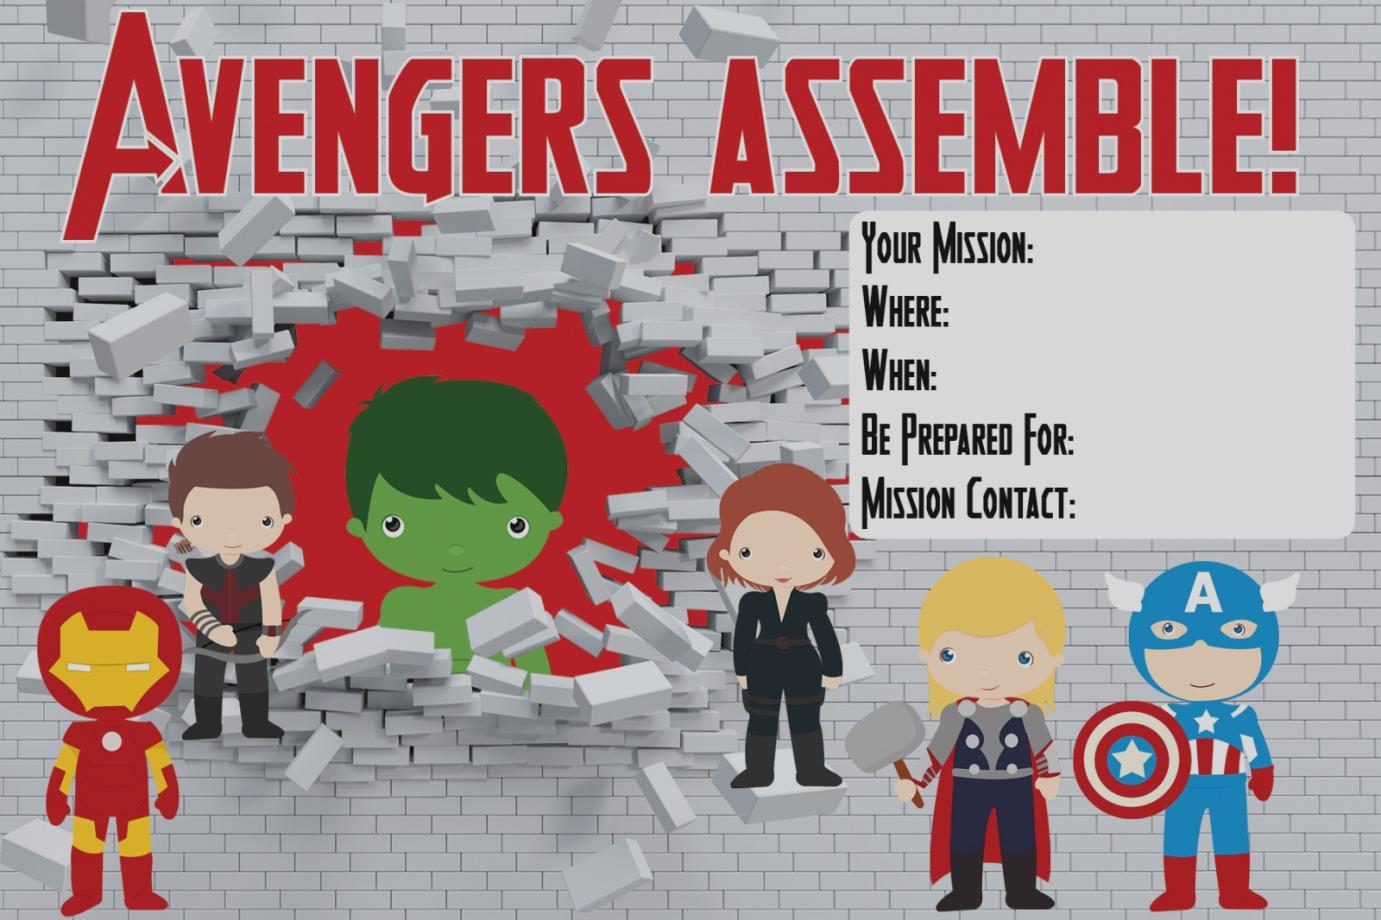 Latest Free Printable Avengers Birthday Party Invitations Ideas As - Free Printable Avengers Birthday Party Invitations